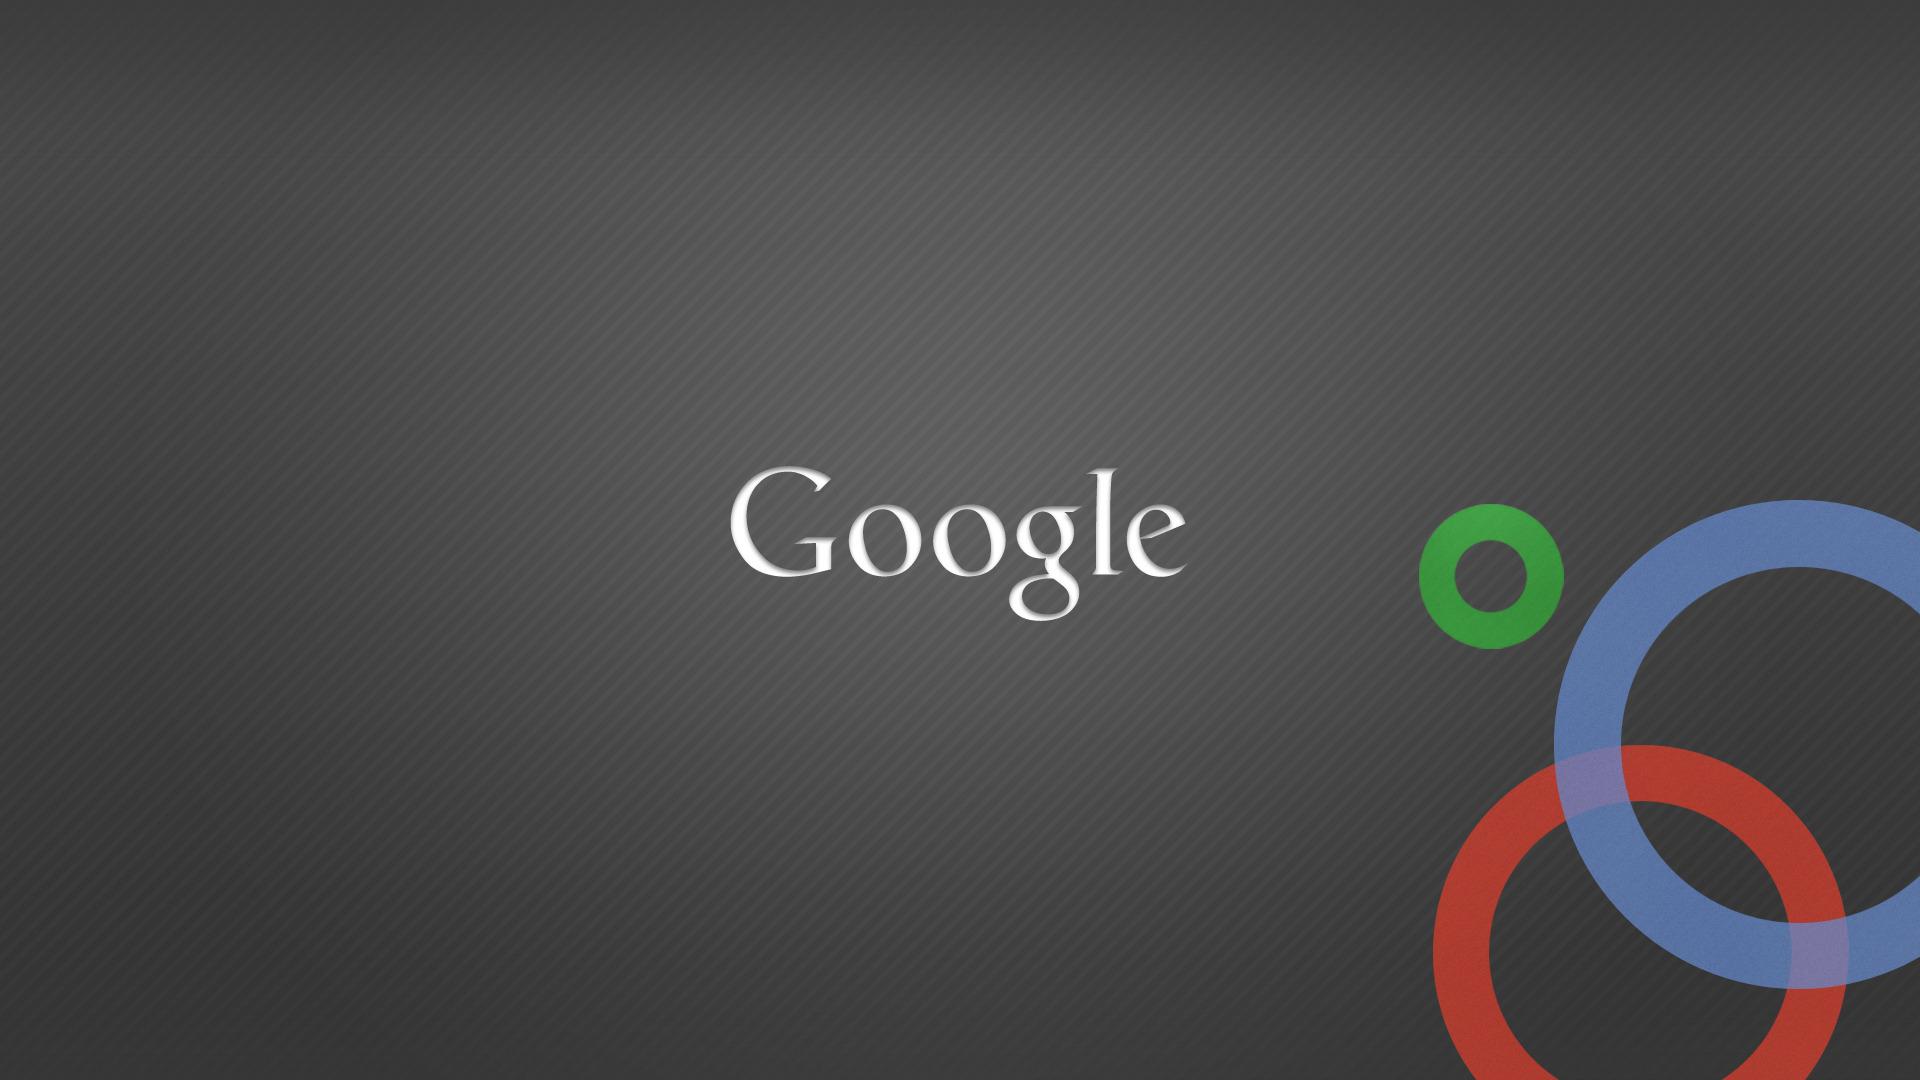 new wallpaper for google - photo #13